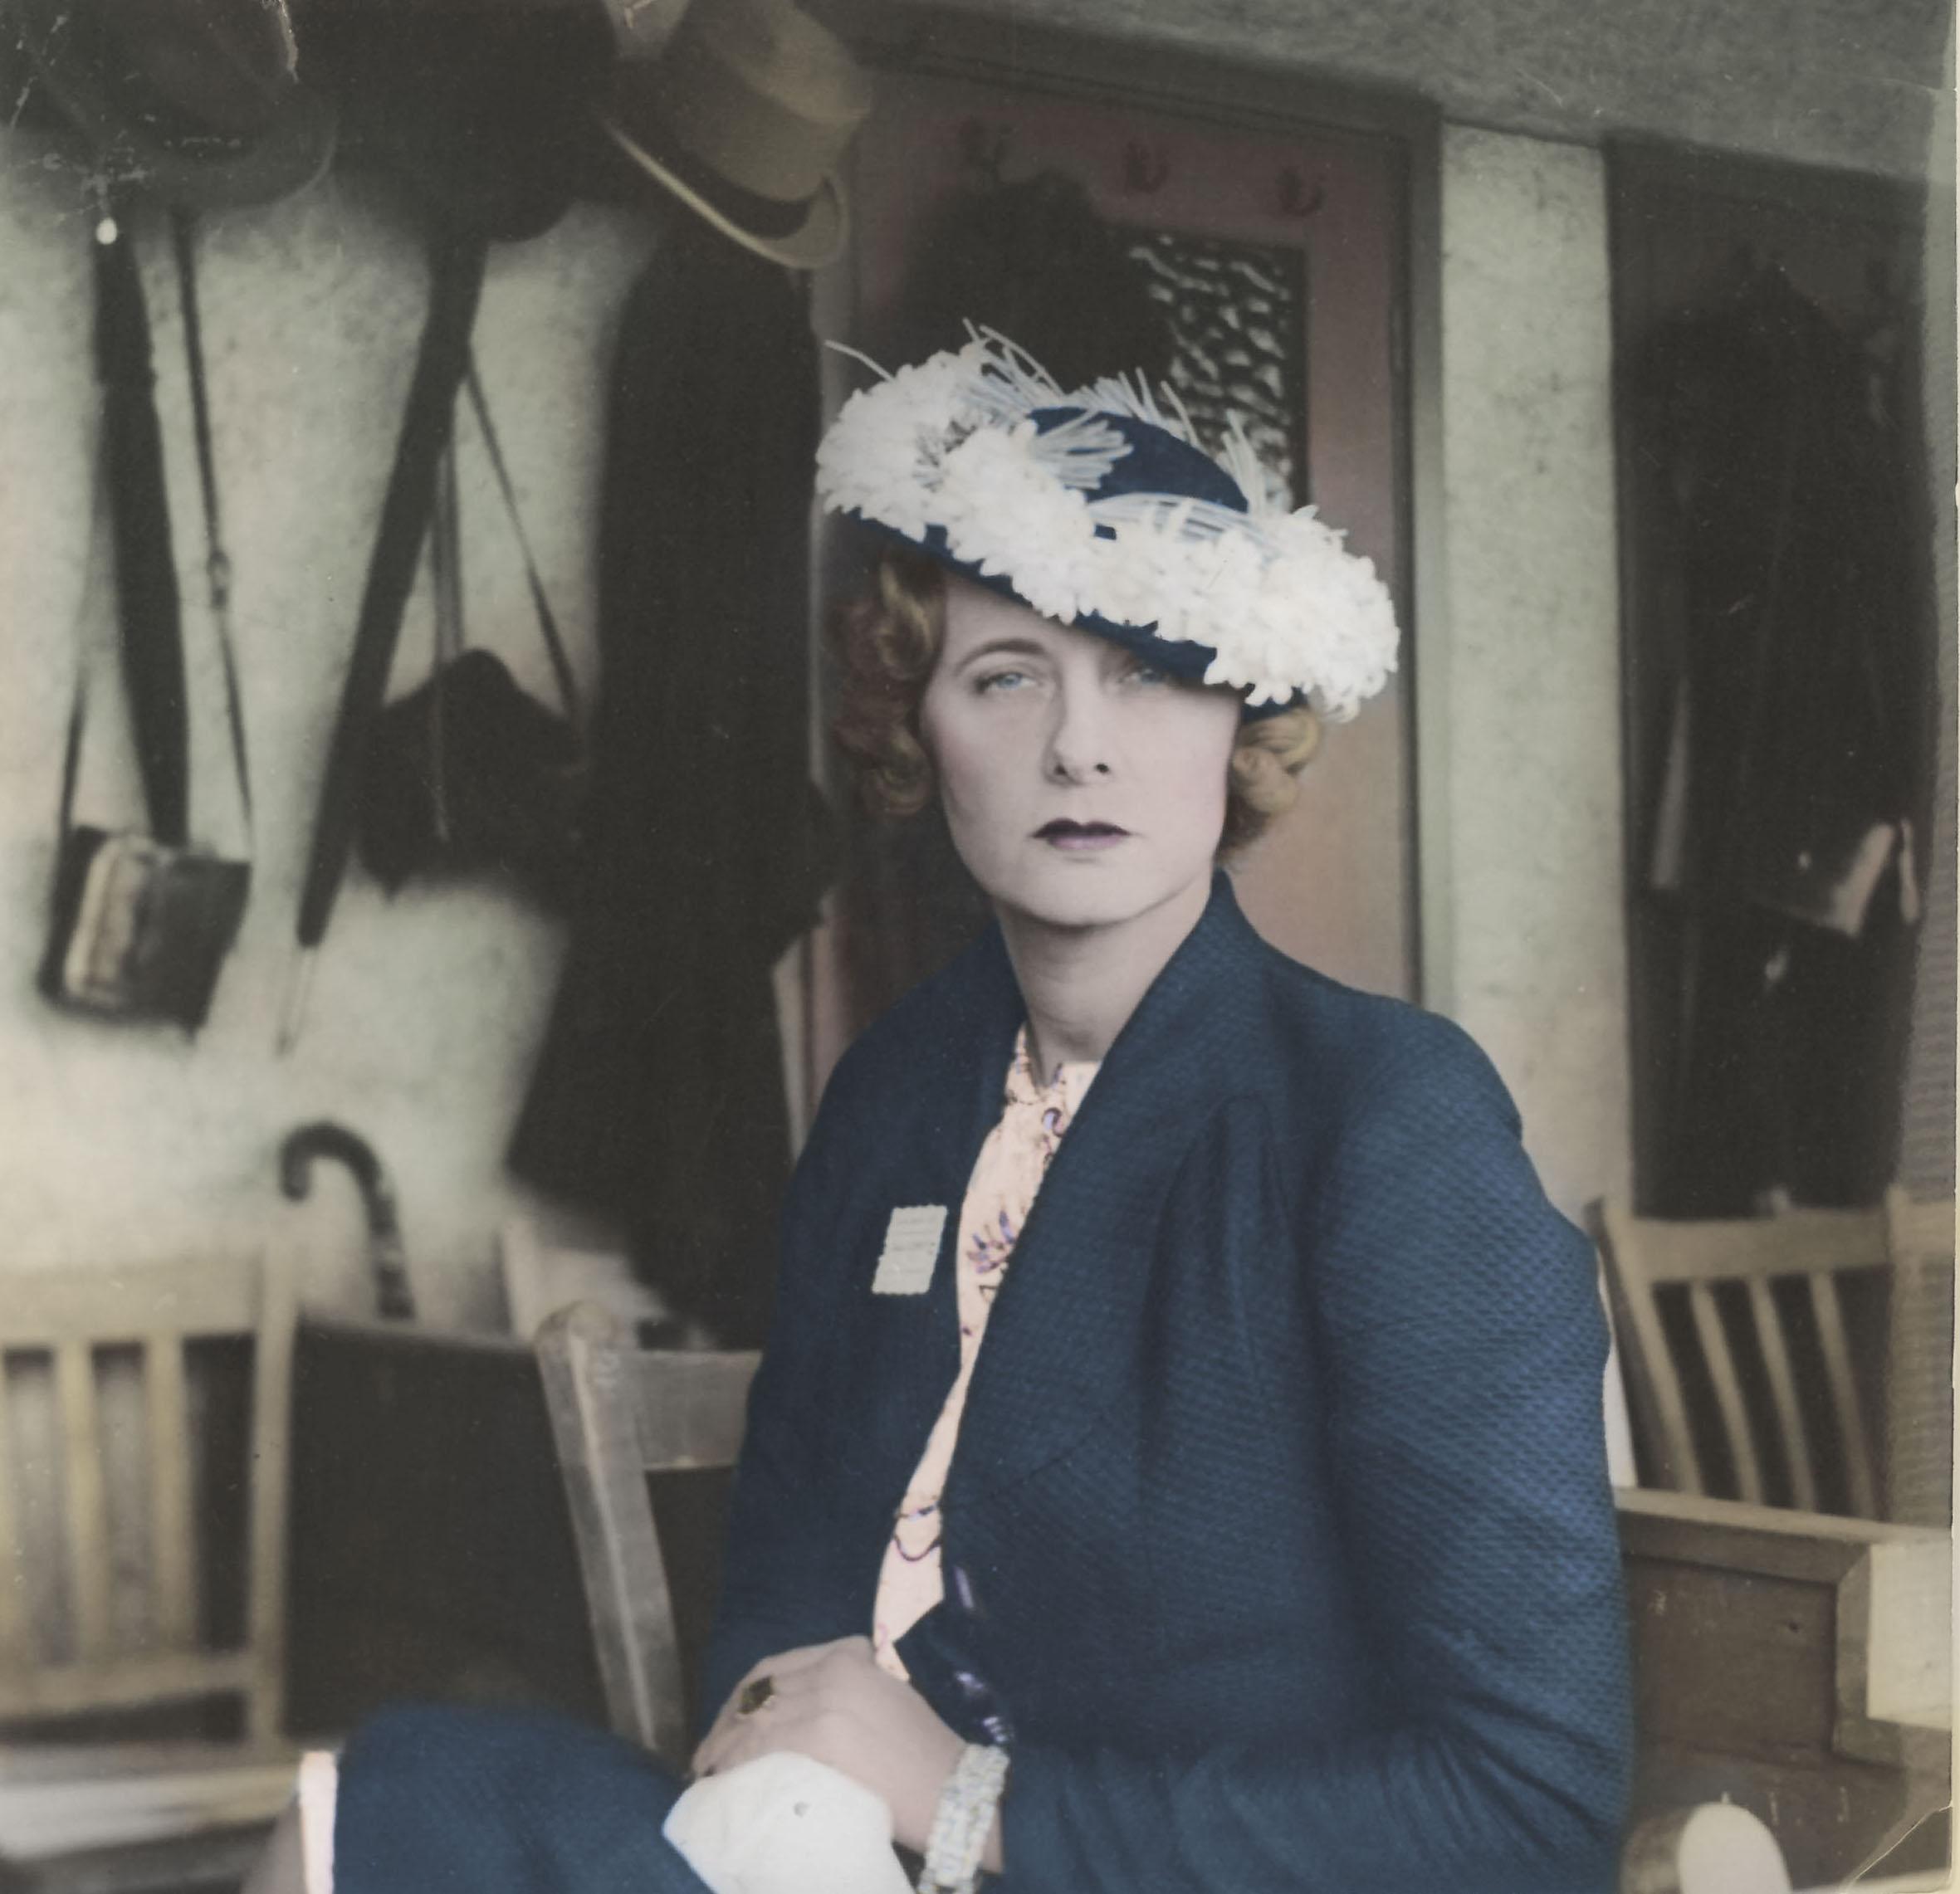 Doris Castlerosse taken in the 1930's